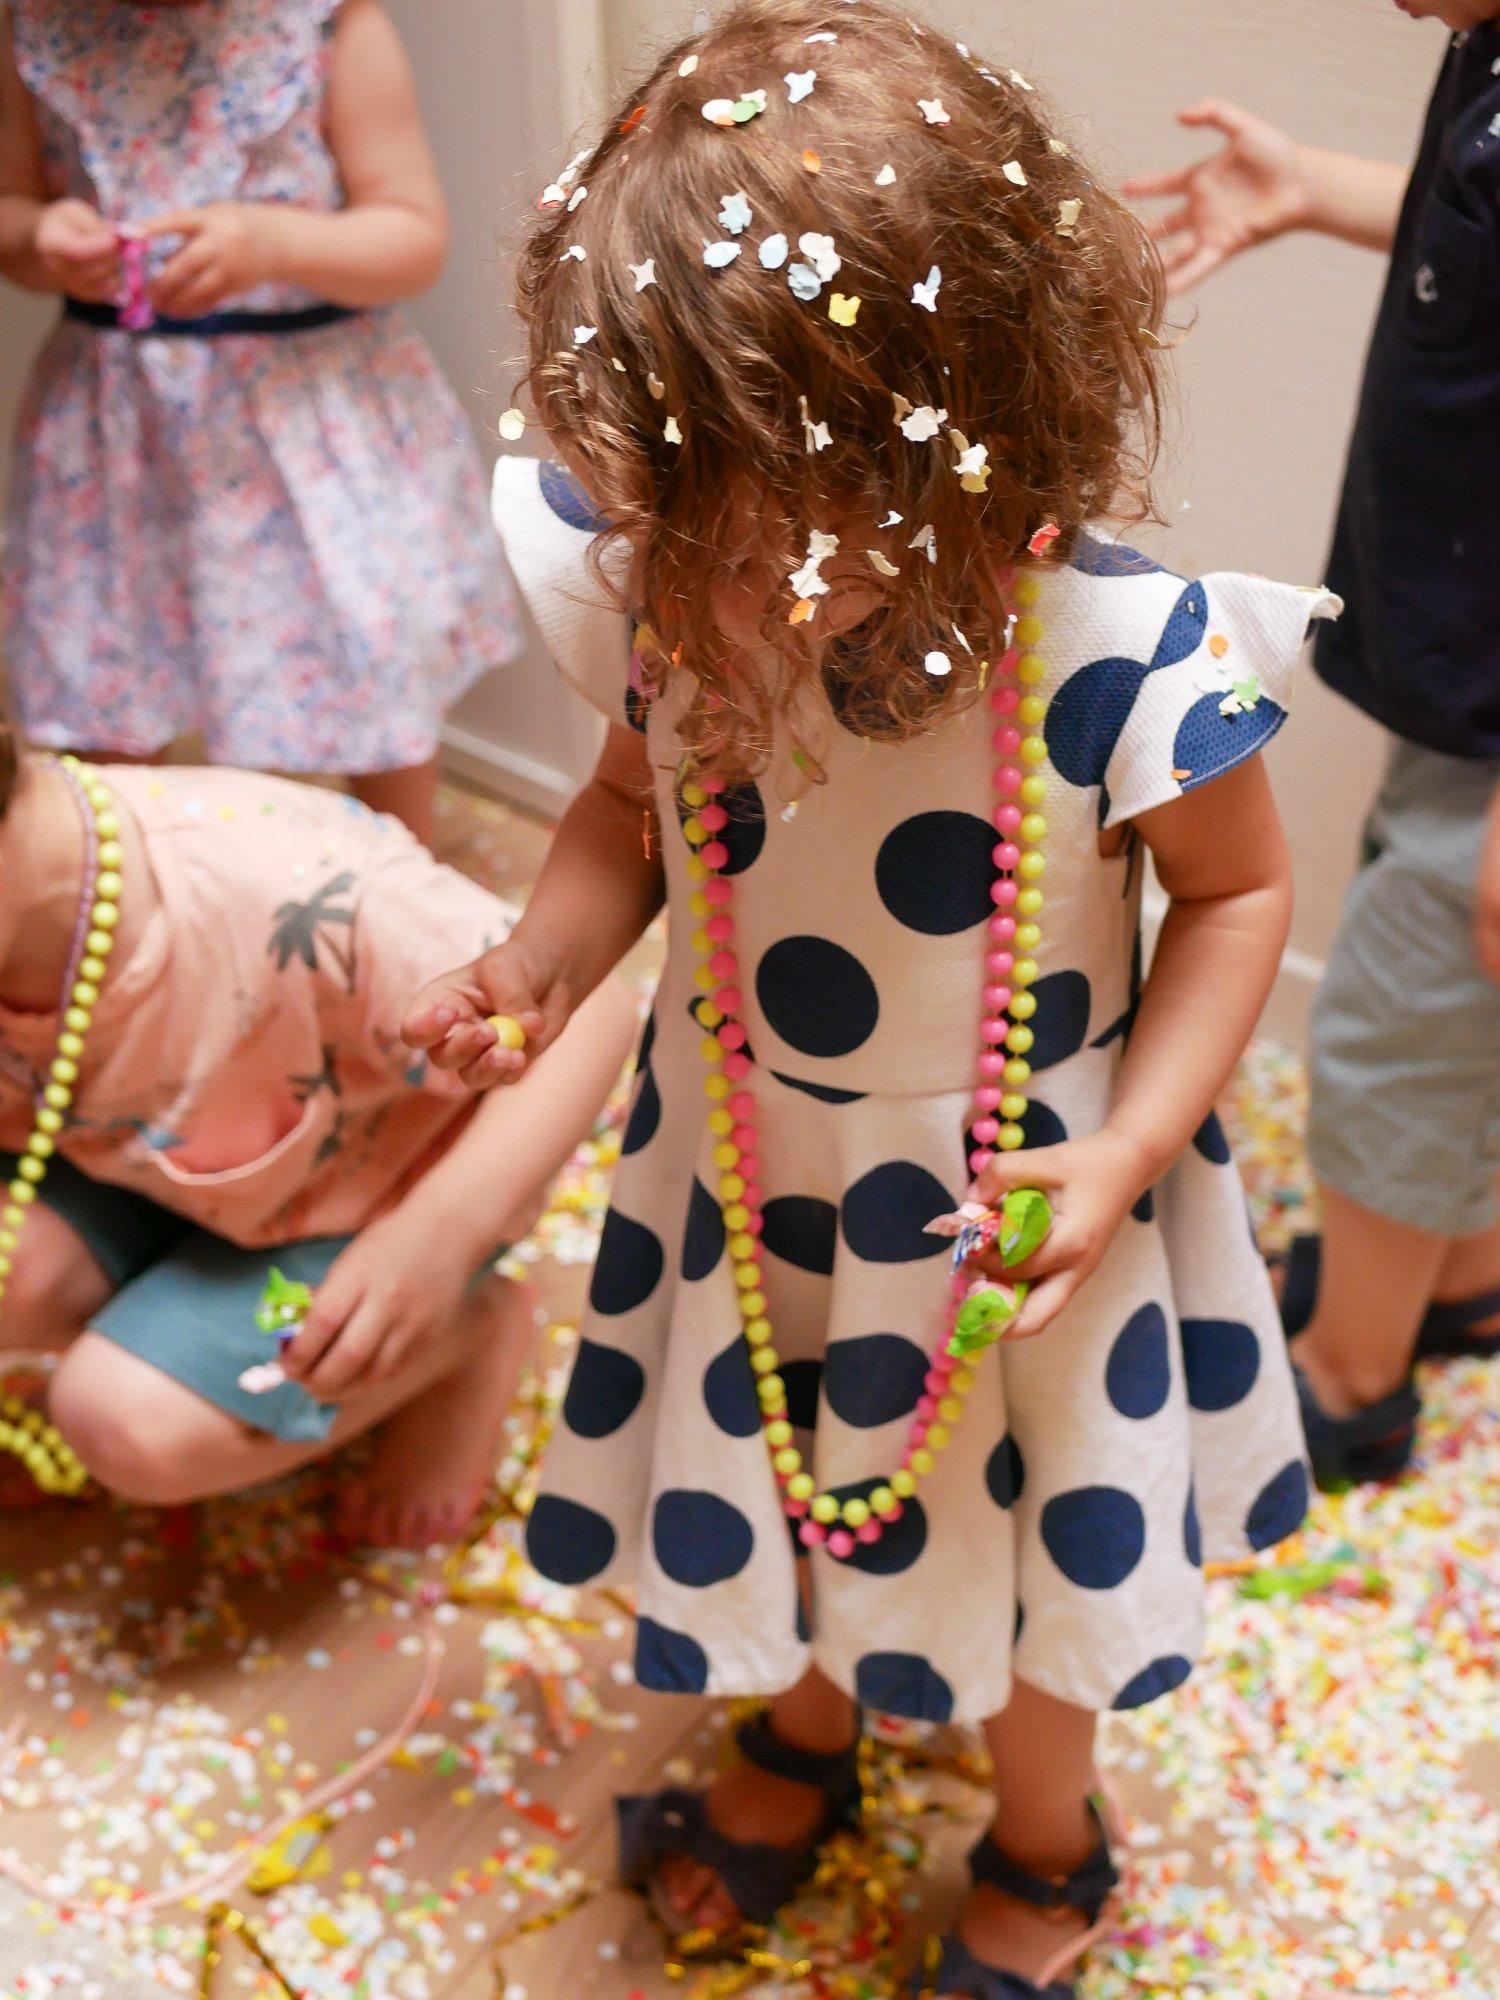 Anniversaire 3 ans - summer party - Borne photo vintage misterlikethat - plus d'infos sur withalovelikethat.fr